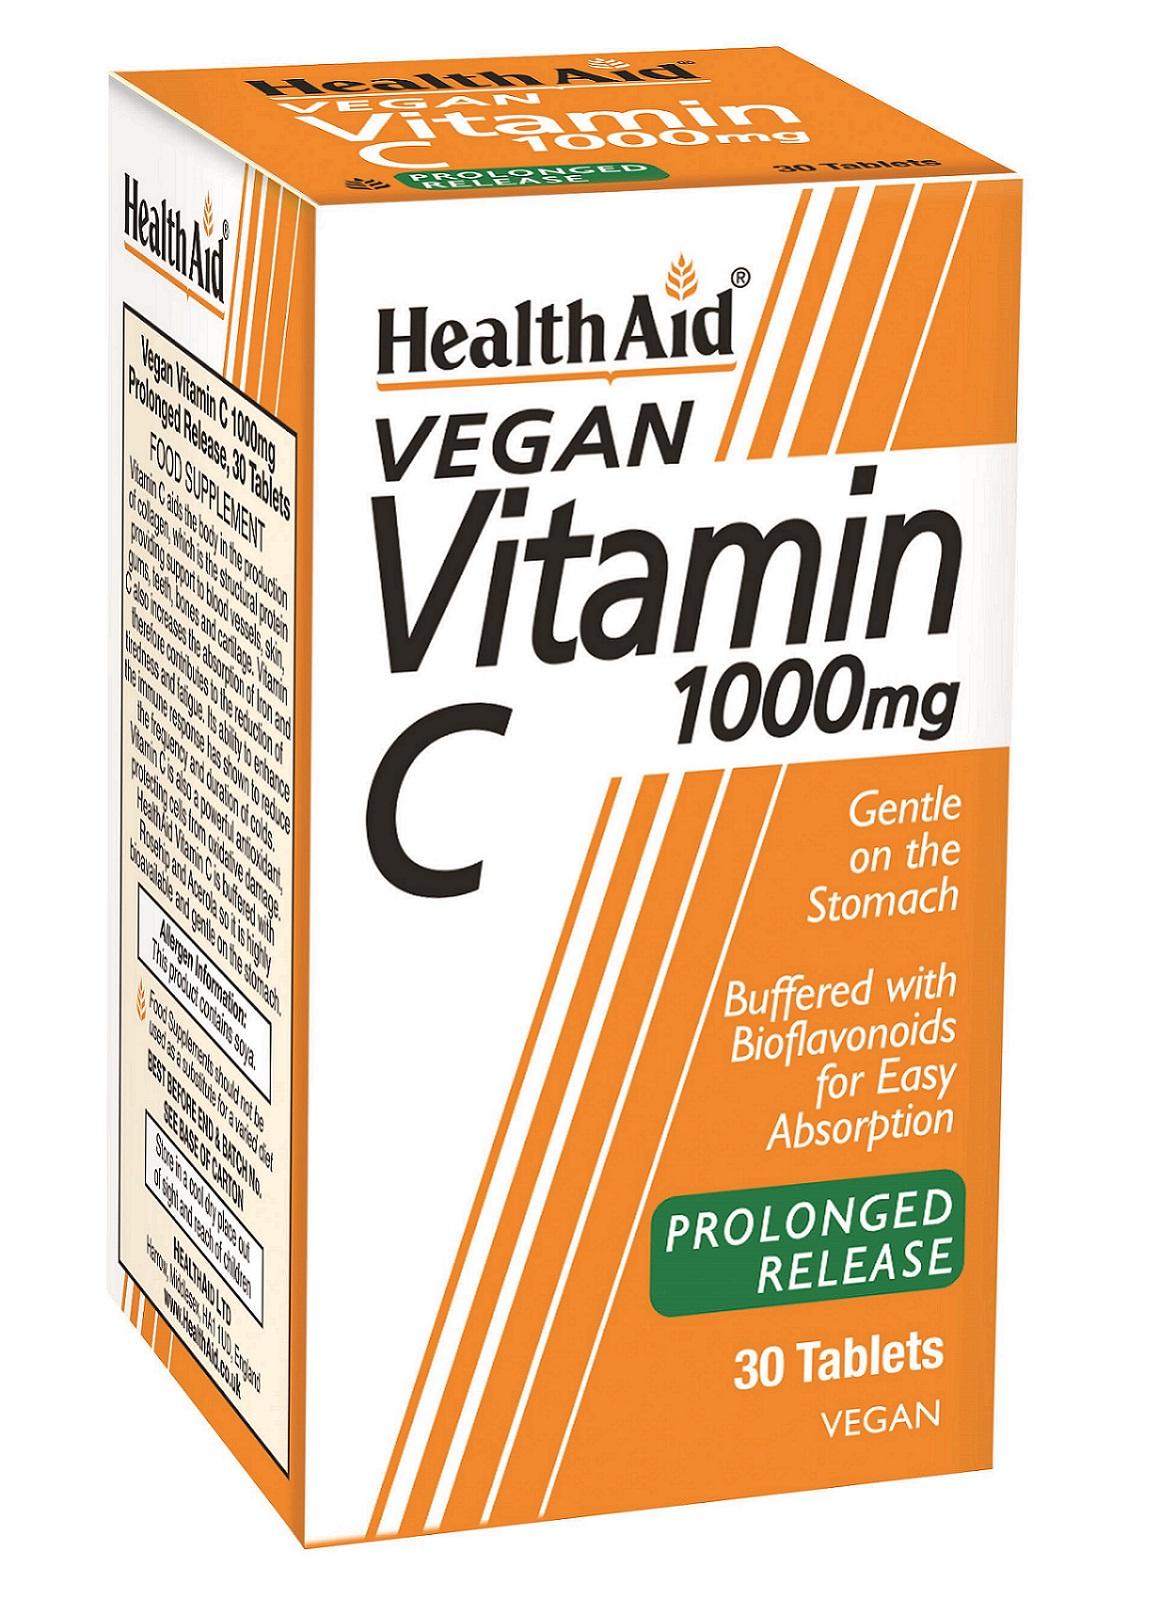 Vegan Vitamin C 1000mg Prolonged Release 30's